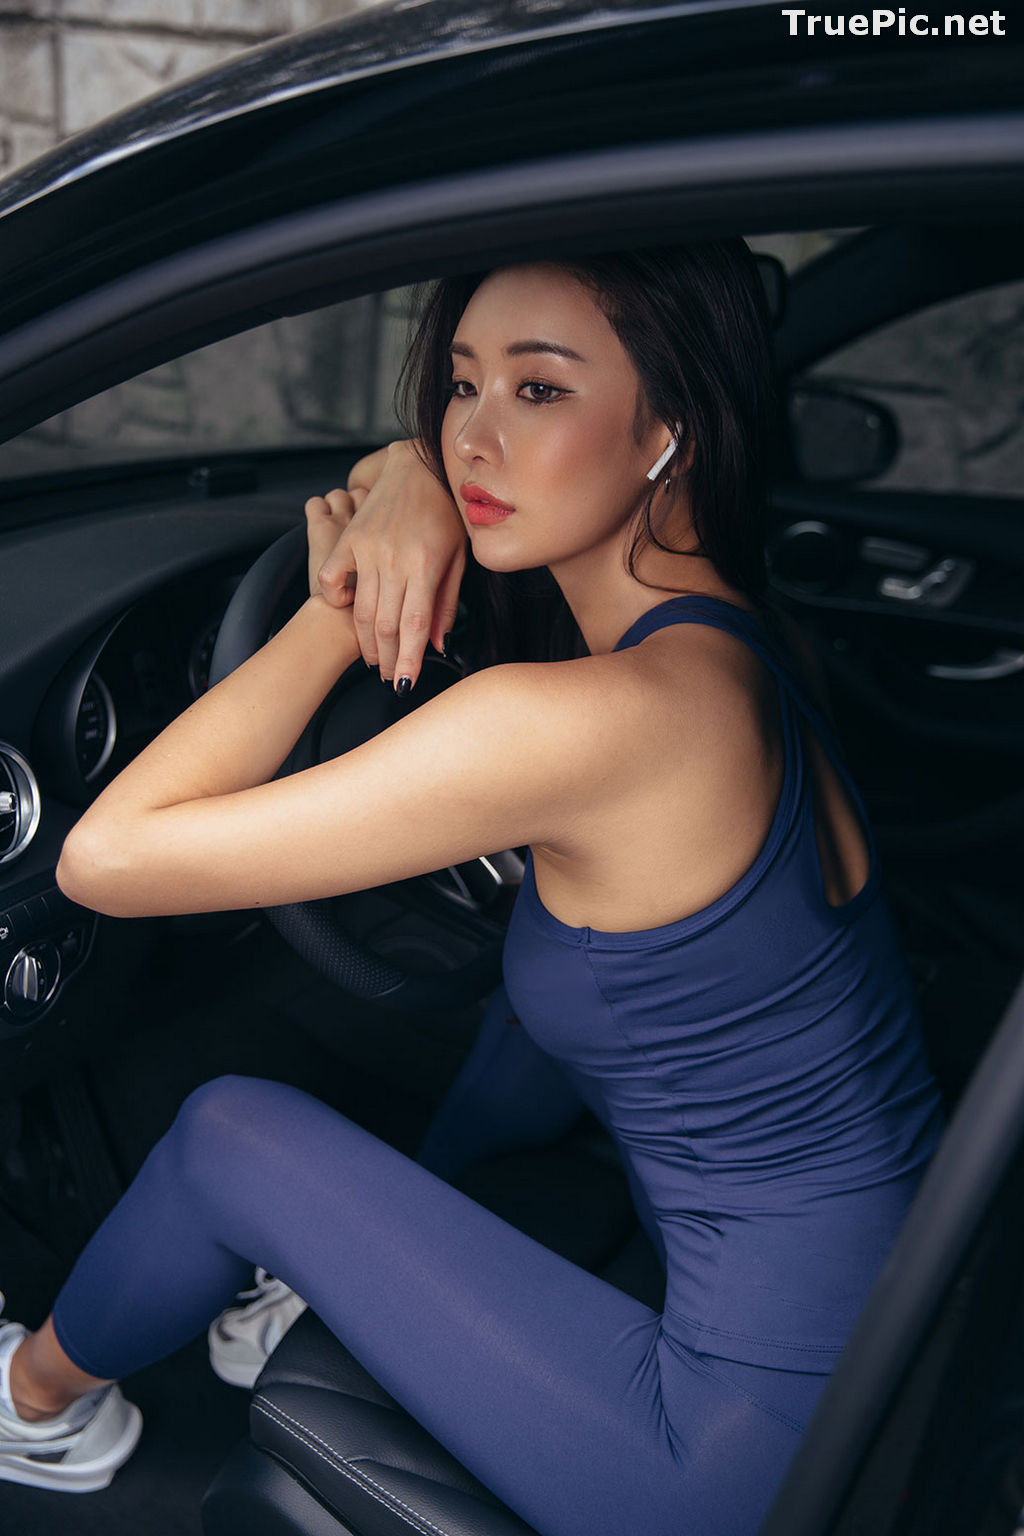 Image Korean Fashion Model - Park Da Hyun - Navy Sportswear - TruePic.net - Picture-1